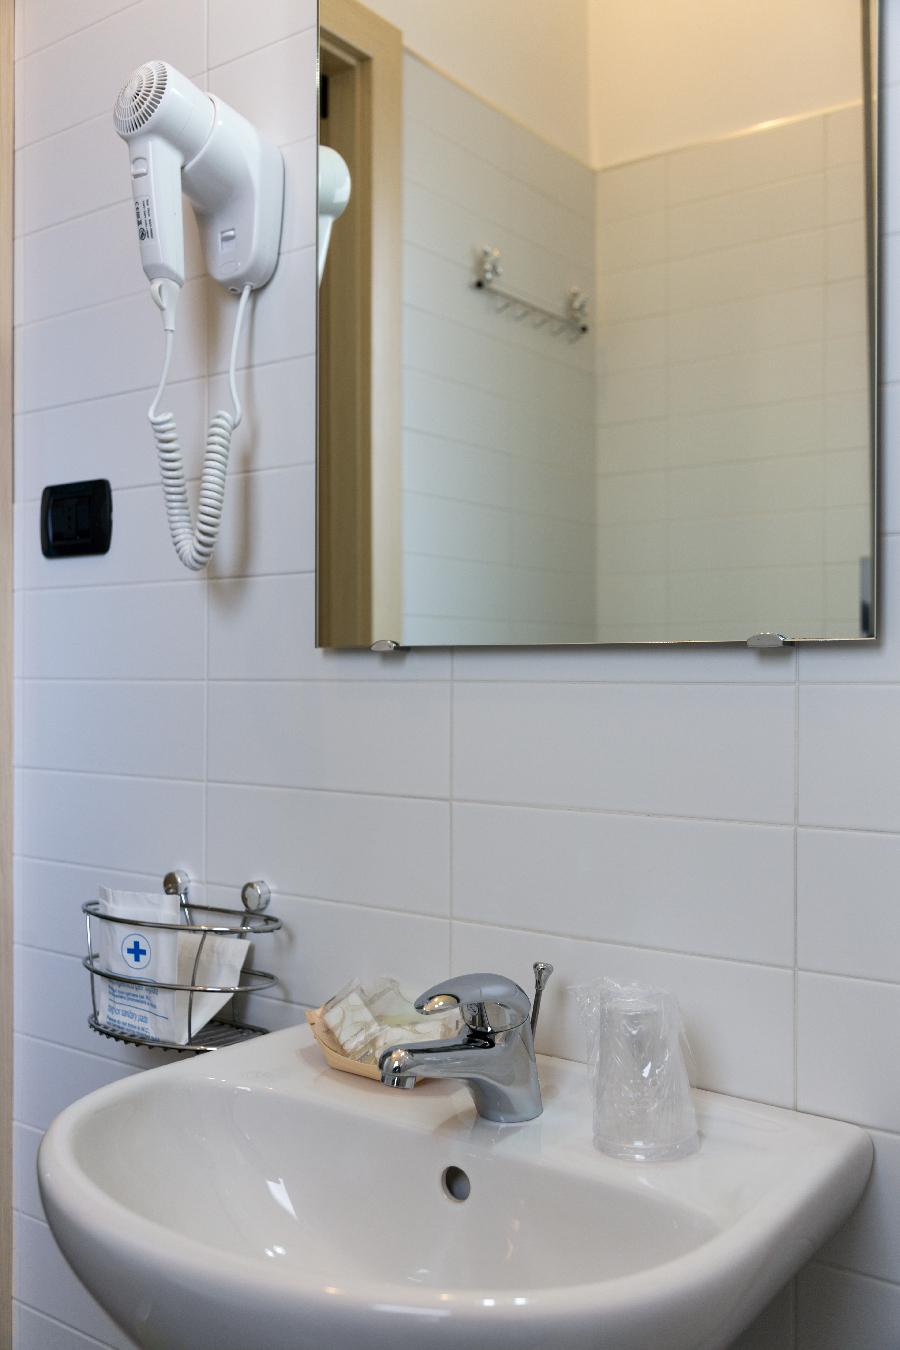 Miramare Hotel Dipendenza Matrimoniale Doppia Comfort 26